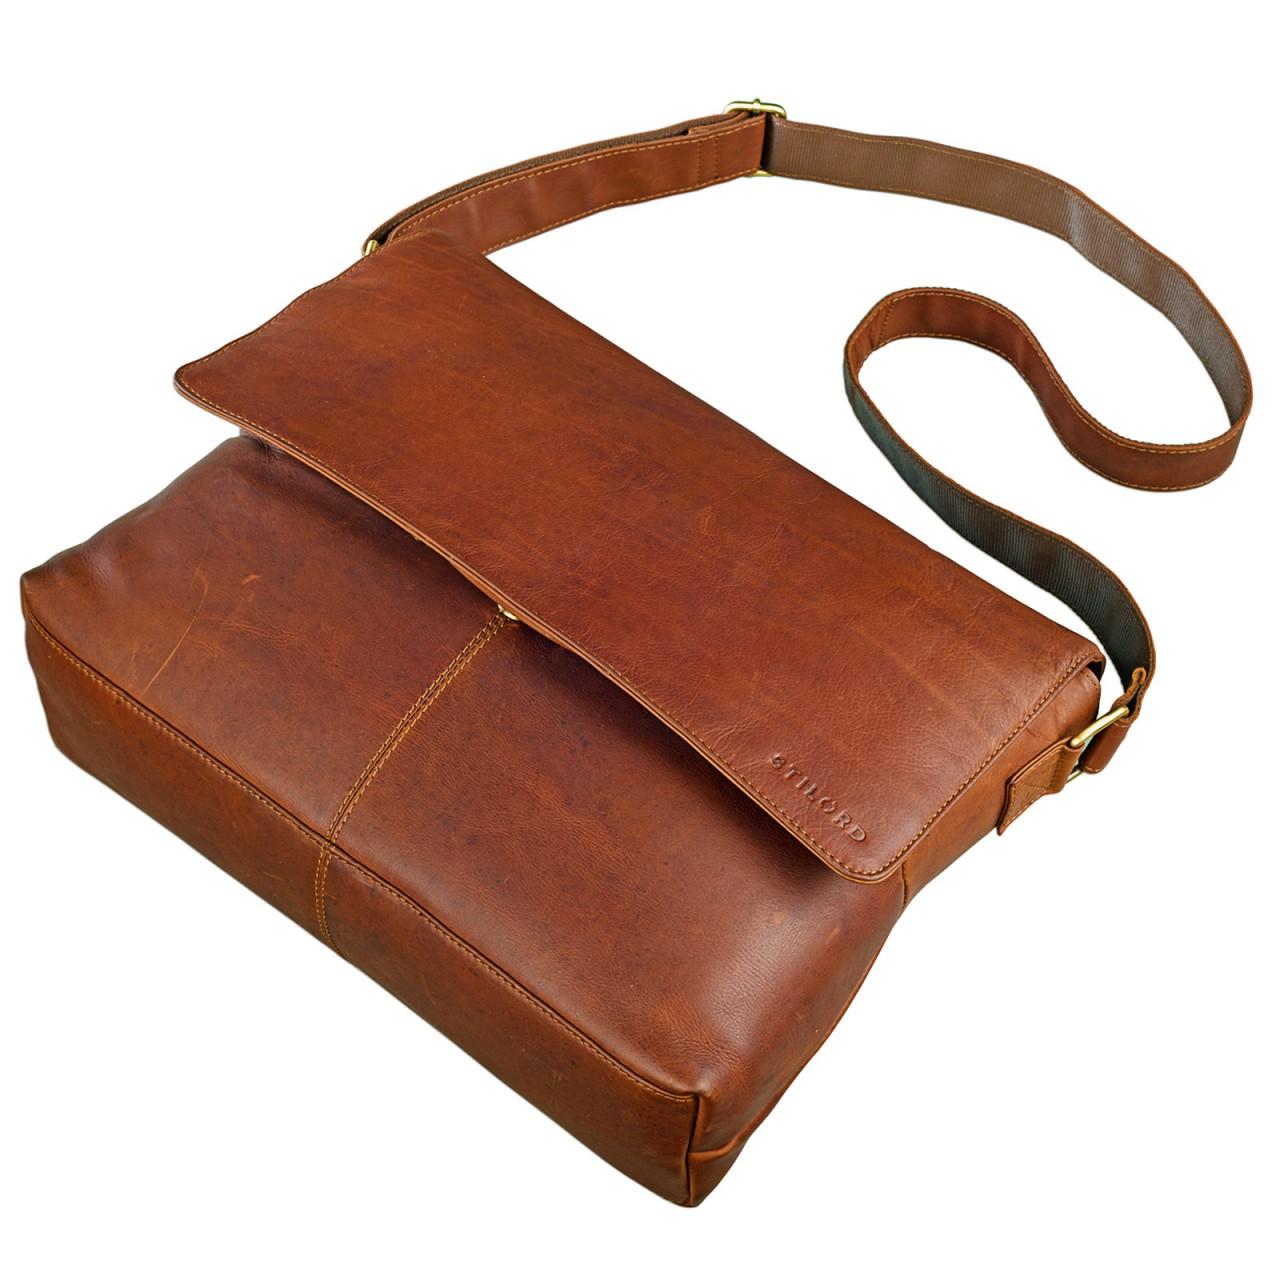 STILORD Messenger Bag Leder Herren Damen Arbeitstasche DIN A4 Dokumententasche Akten Büro Uni Freizeit für 15,6 Zoll Laptop Büffelleder Cognac - Bild 4